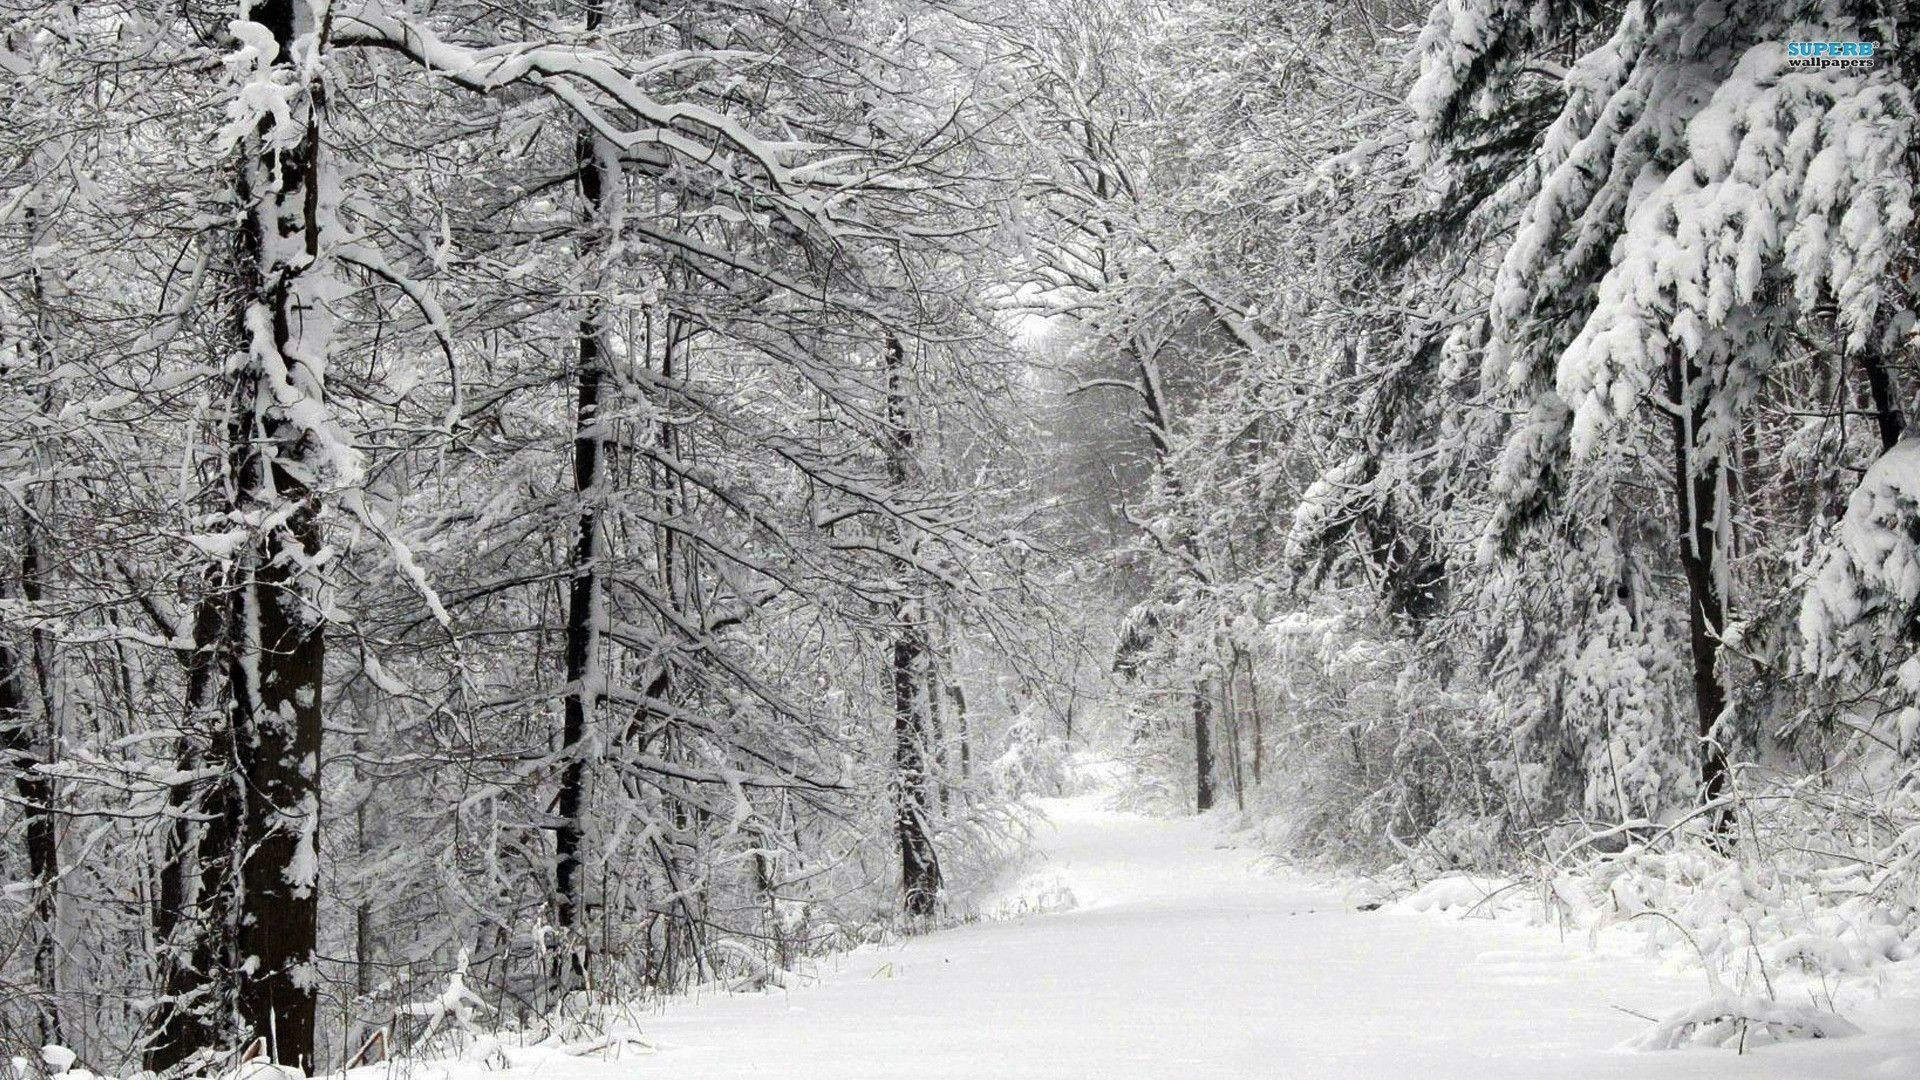 snowy-forest-wallpaper.jpg